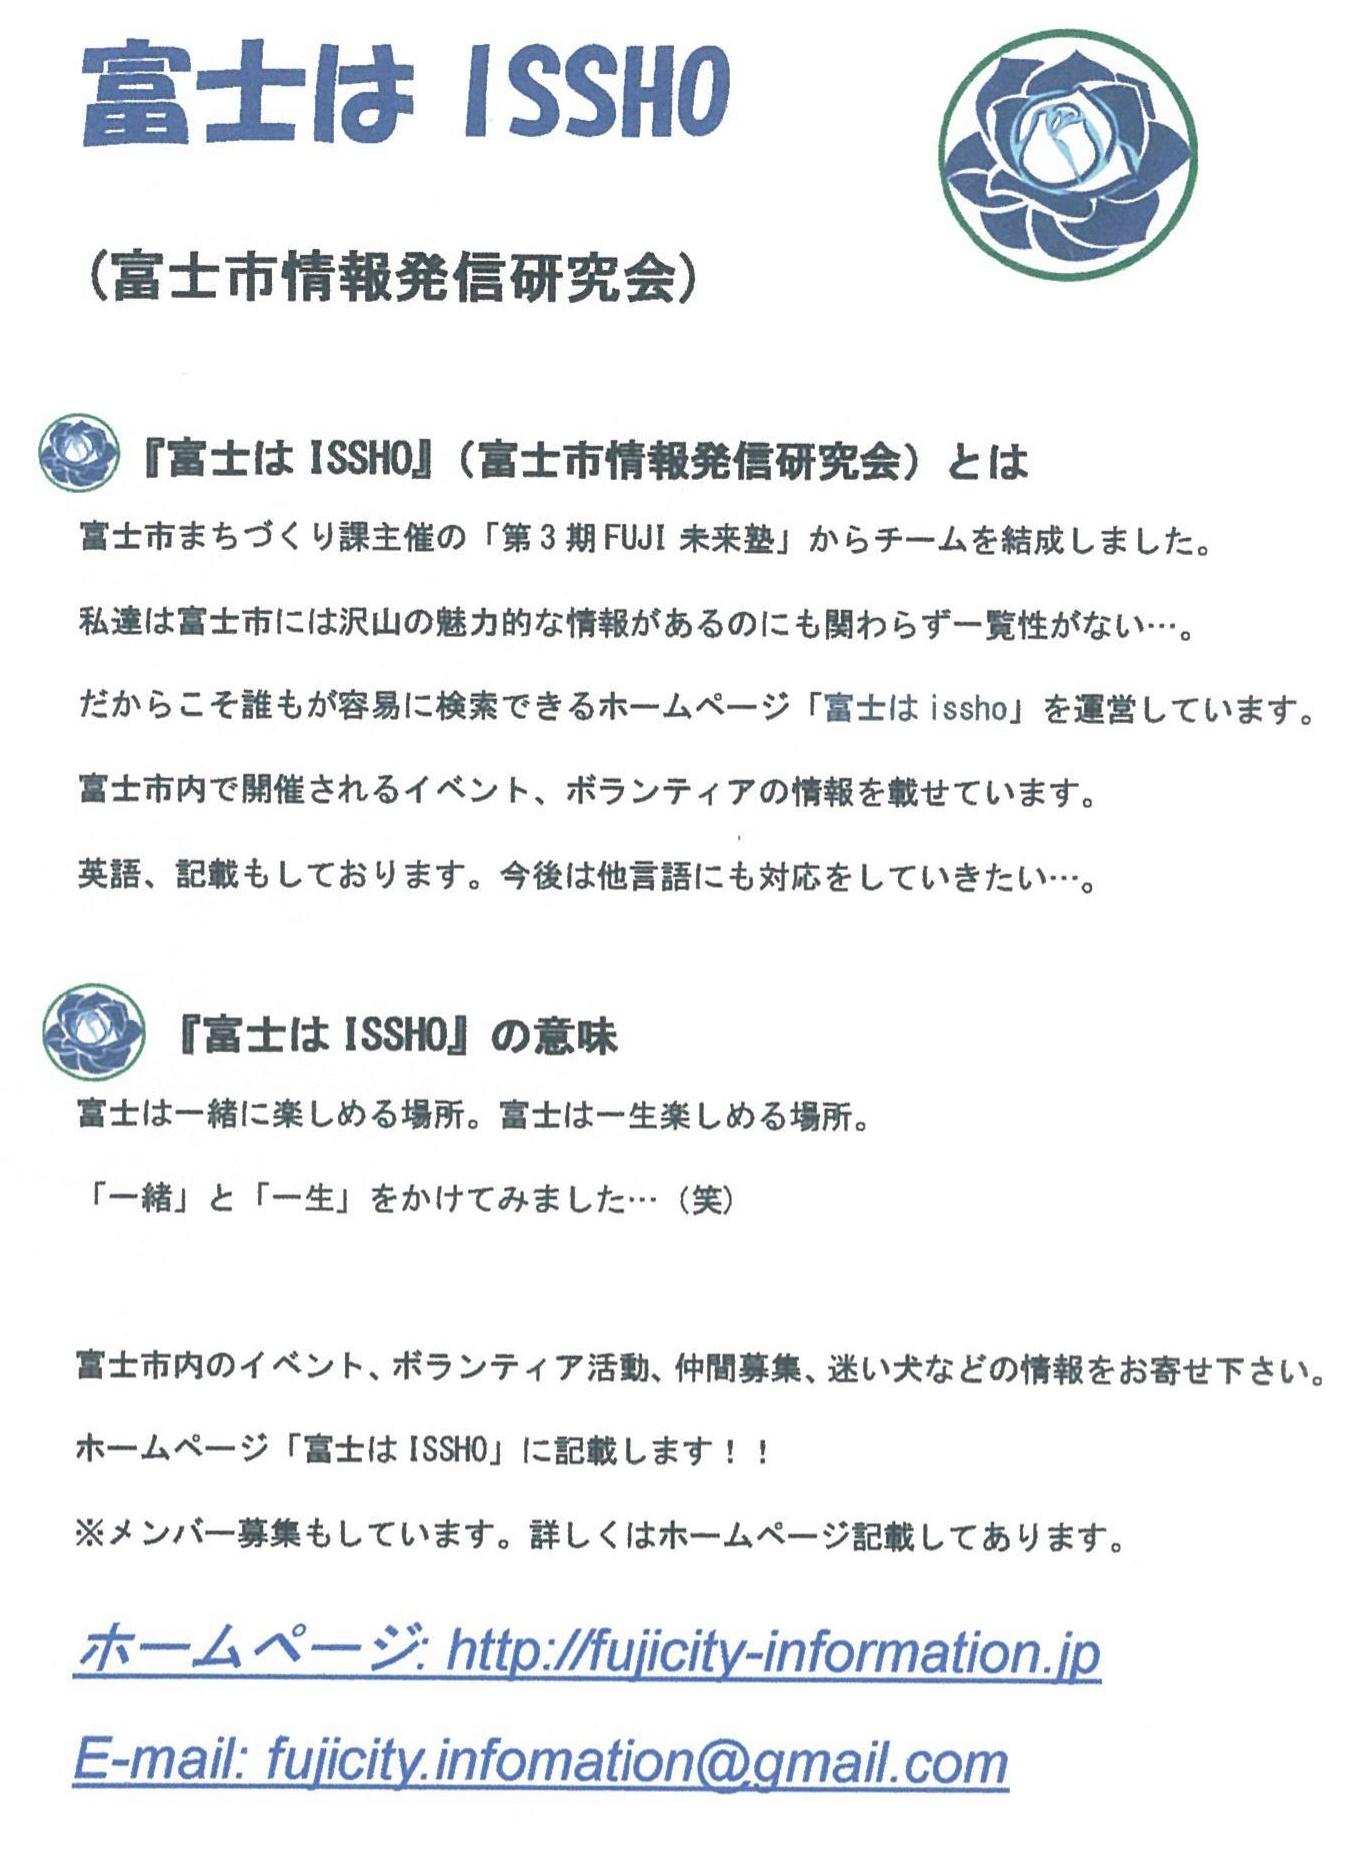 「FUJI未来塾」卒業生が取り組むアートなまちづくりと情報発信 「オール富士さん」全体会で_f0141310_09054806.jpg